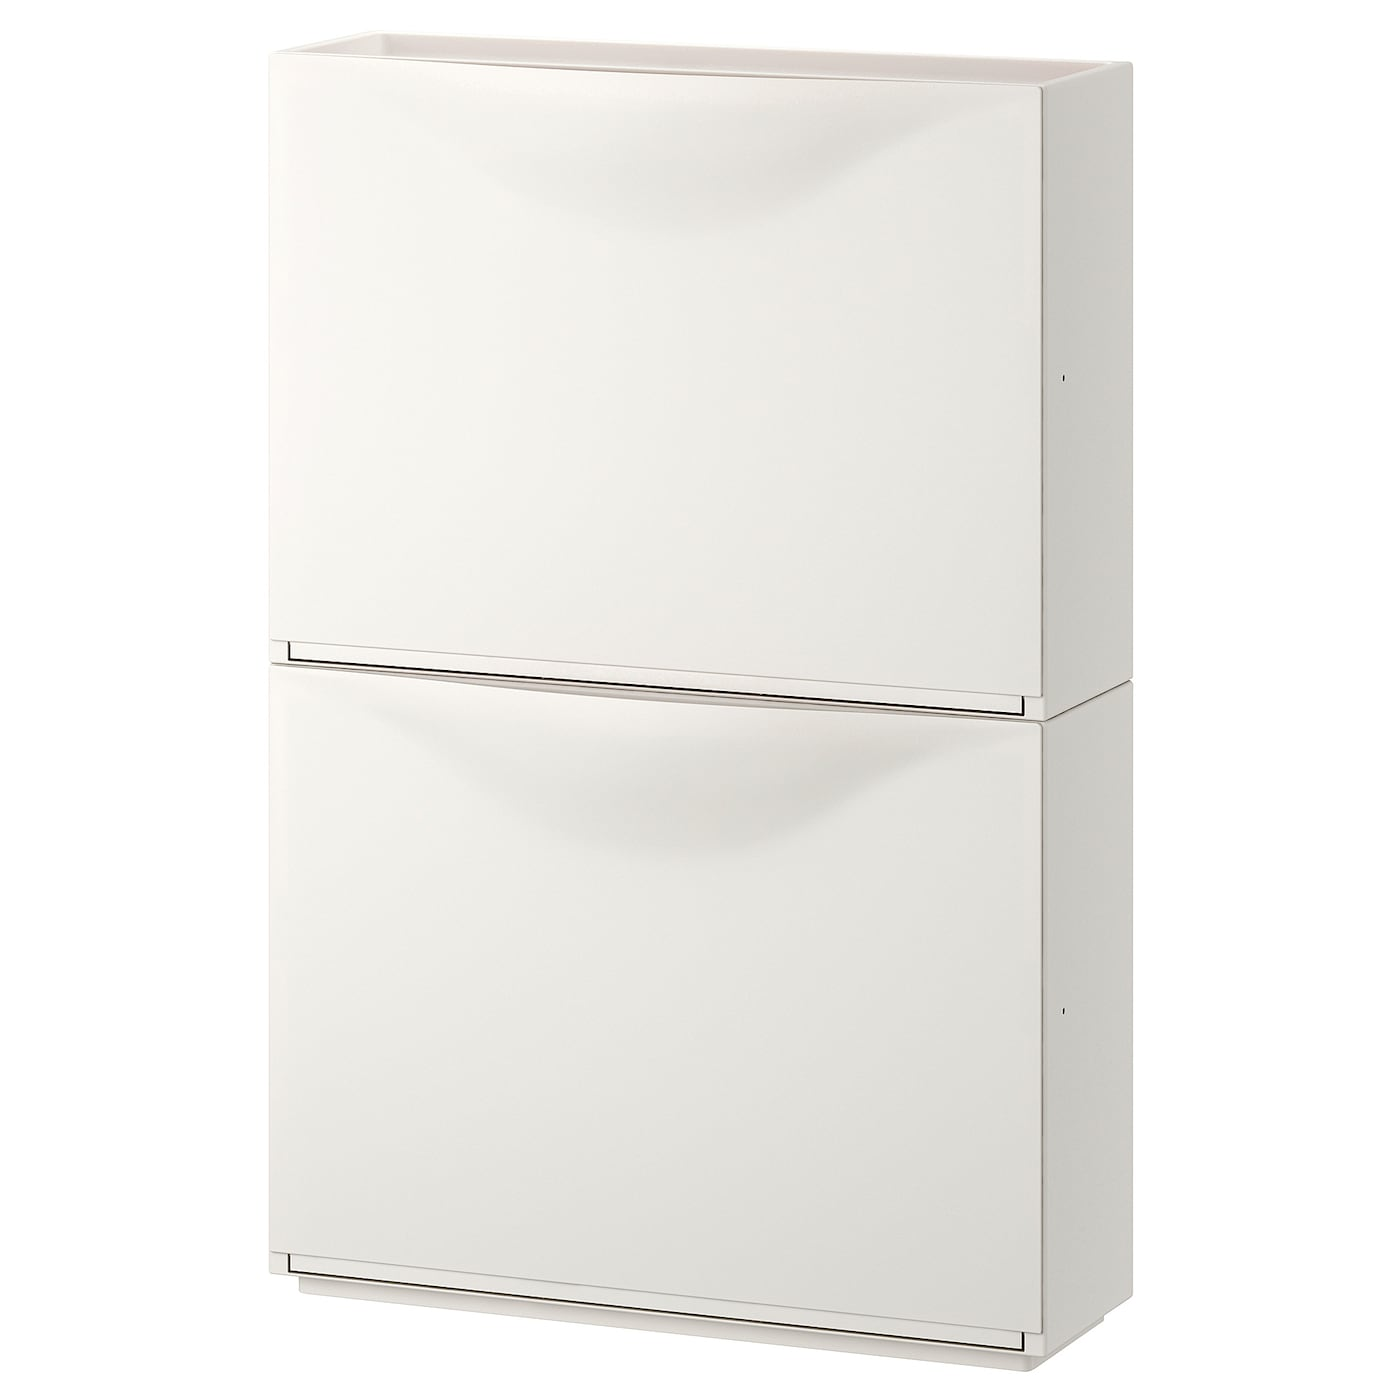 Trones Armoire A Chaussures Rangement Blanc 52x39 Cm Ikea